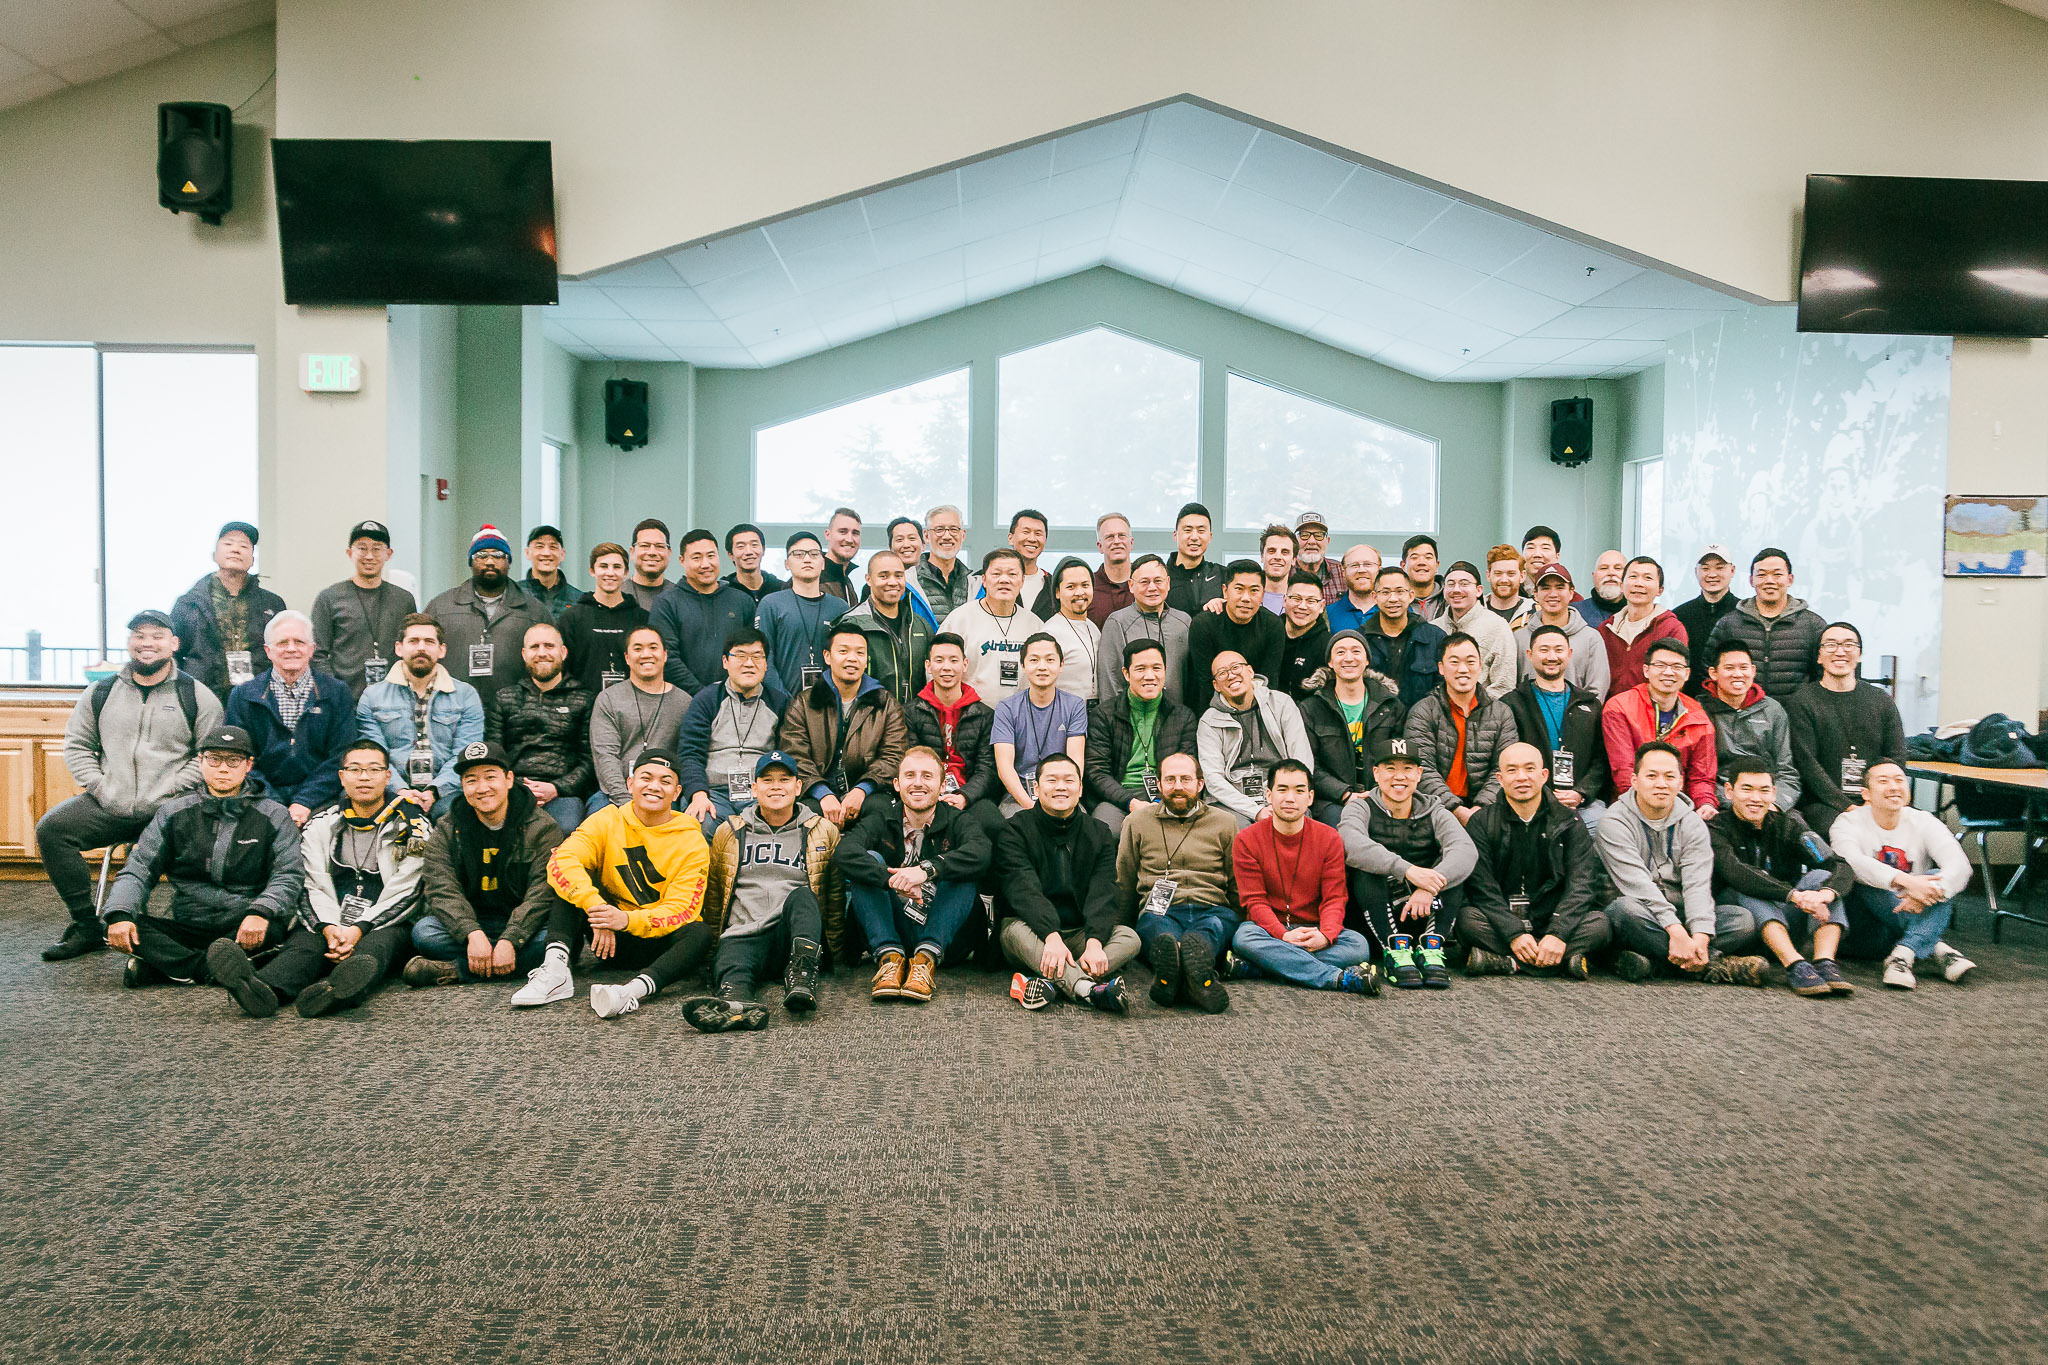 2019-03_Epicentre Men's Retreat_Group Photos (1 of 2) Social Media.JPG